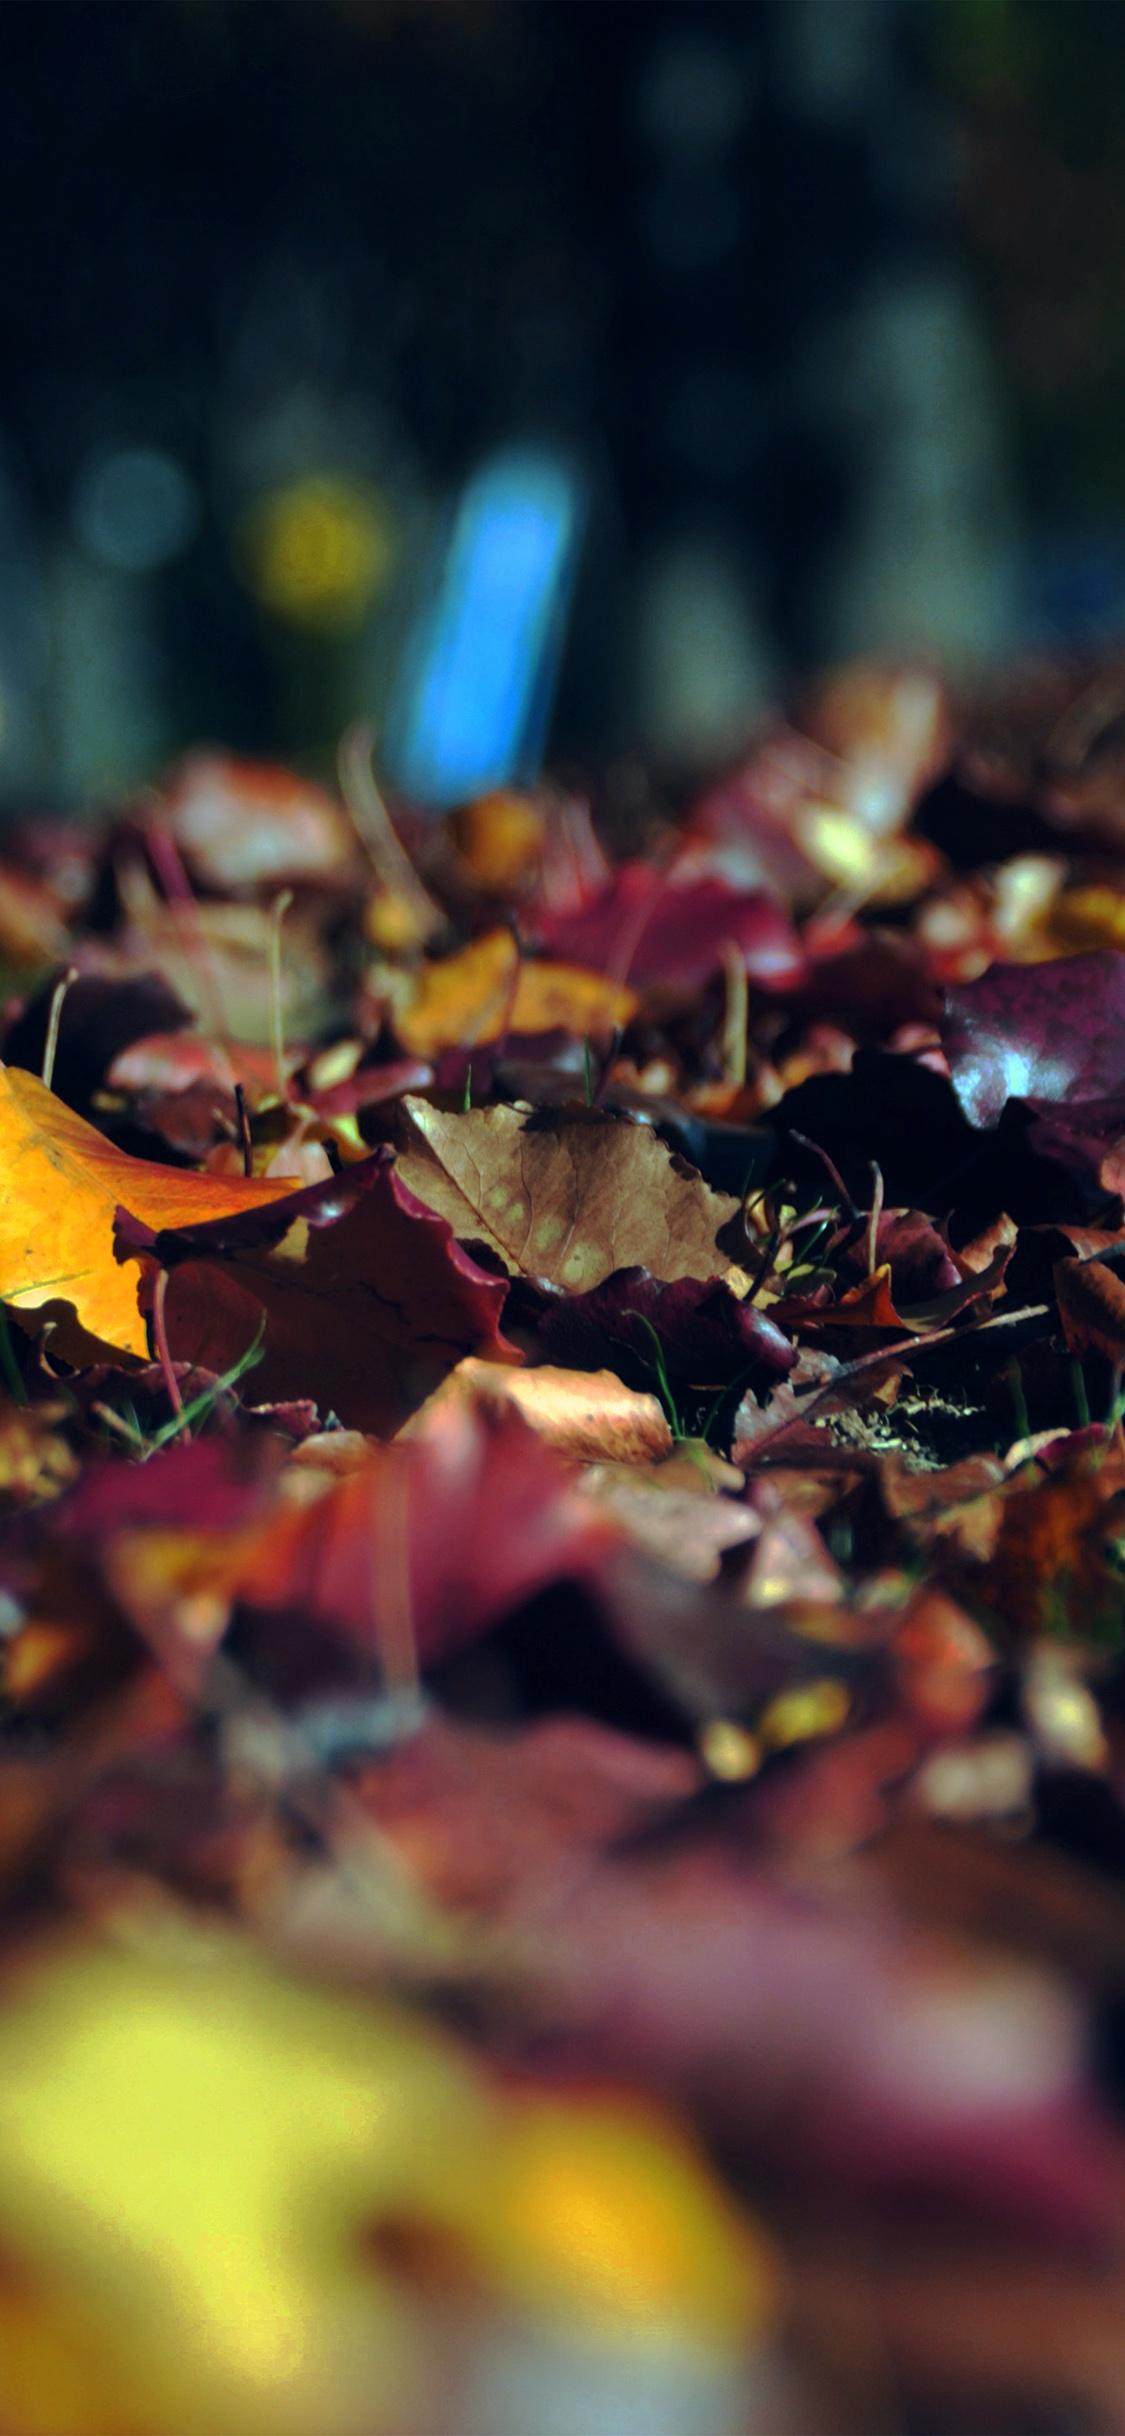 Iphone11papers Com Iphone11 Wallpaper Nk45 Fall Mountain Leaf Brown Bokeh Nature Dark